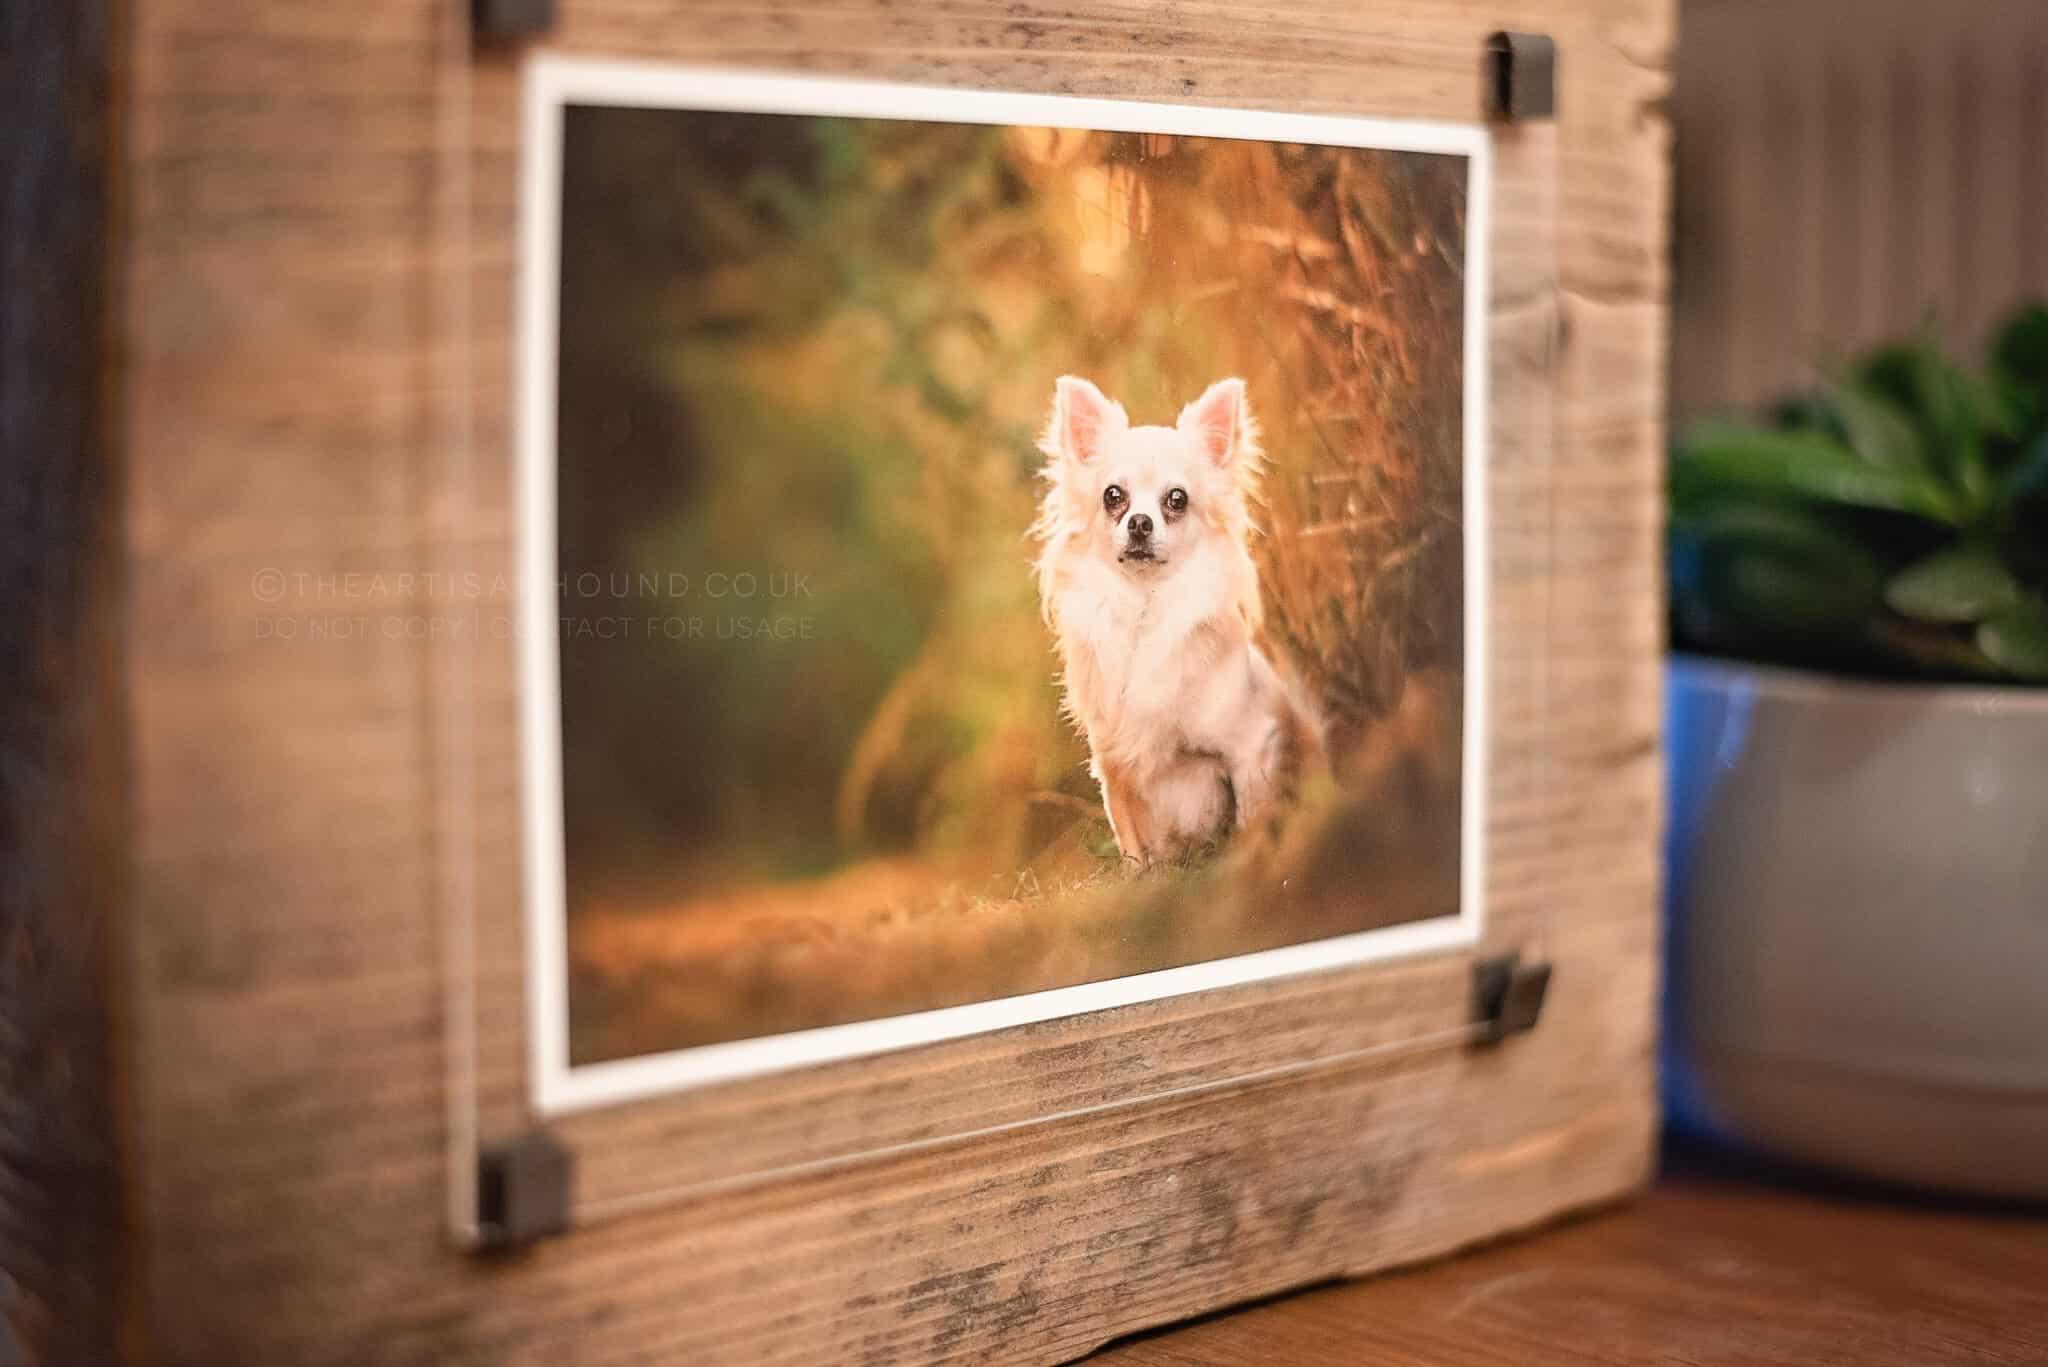 fine-art-print-mounted-on-wood